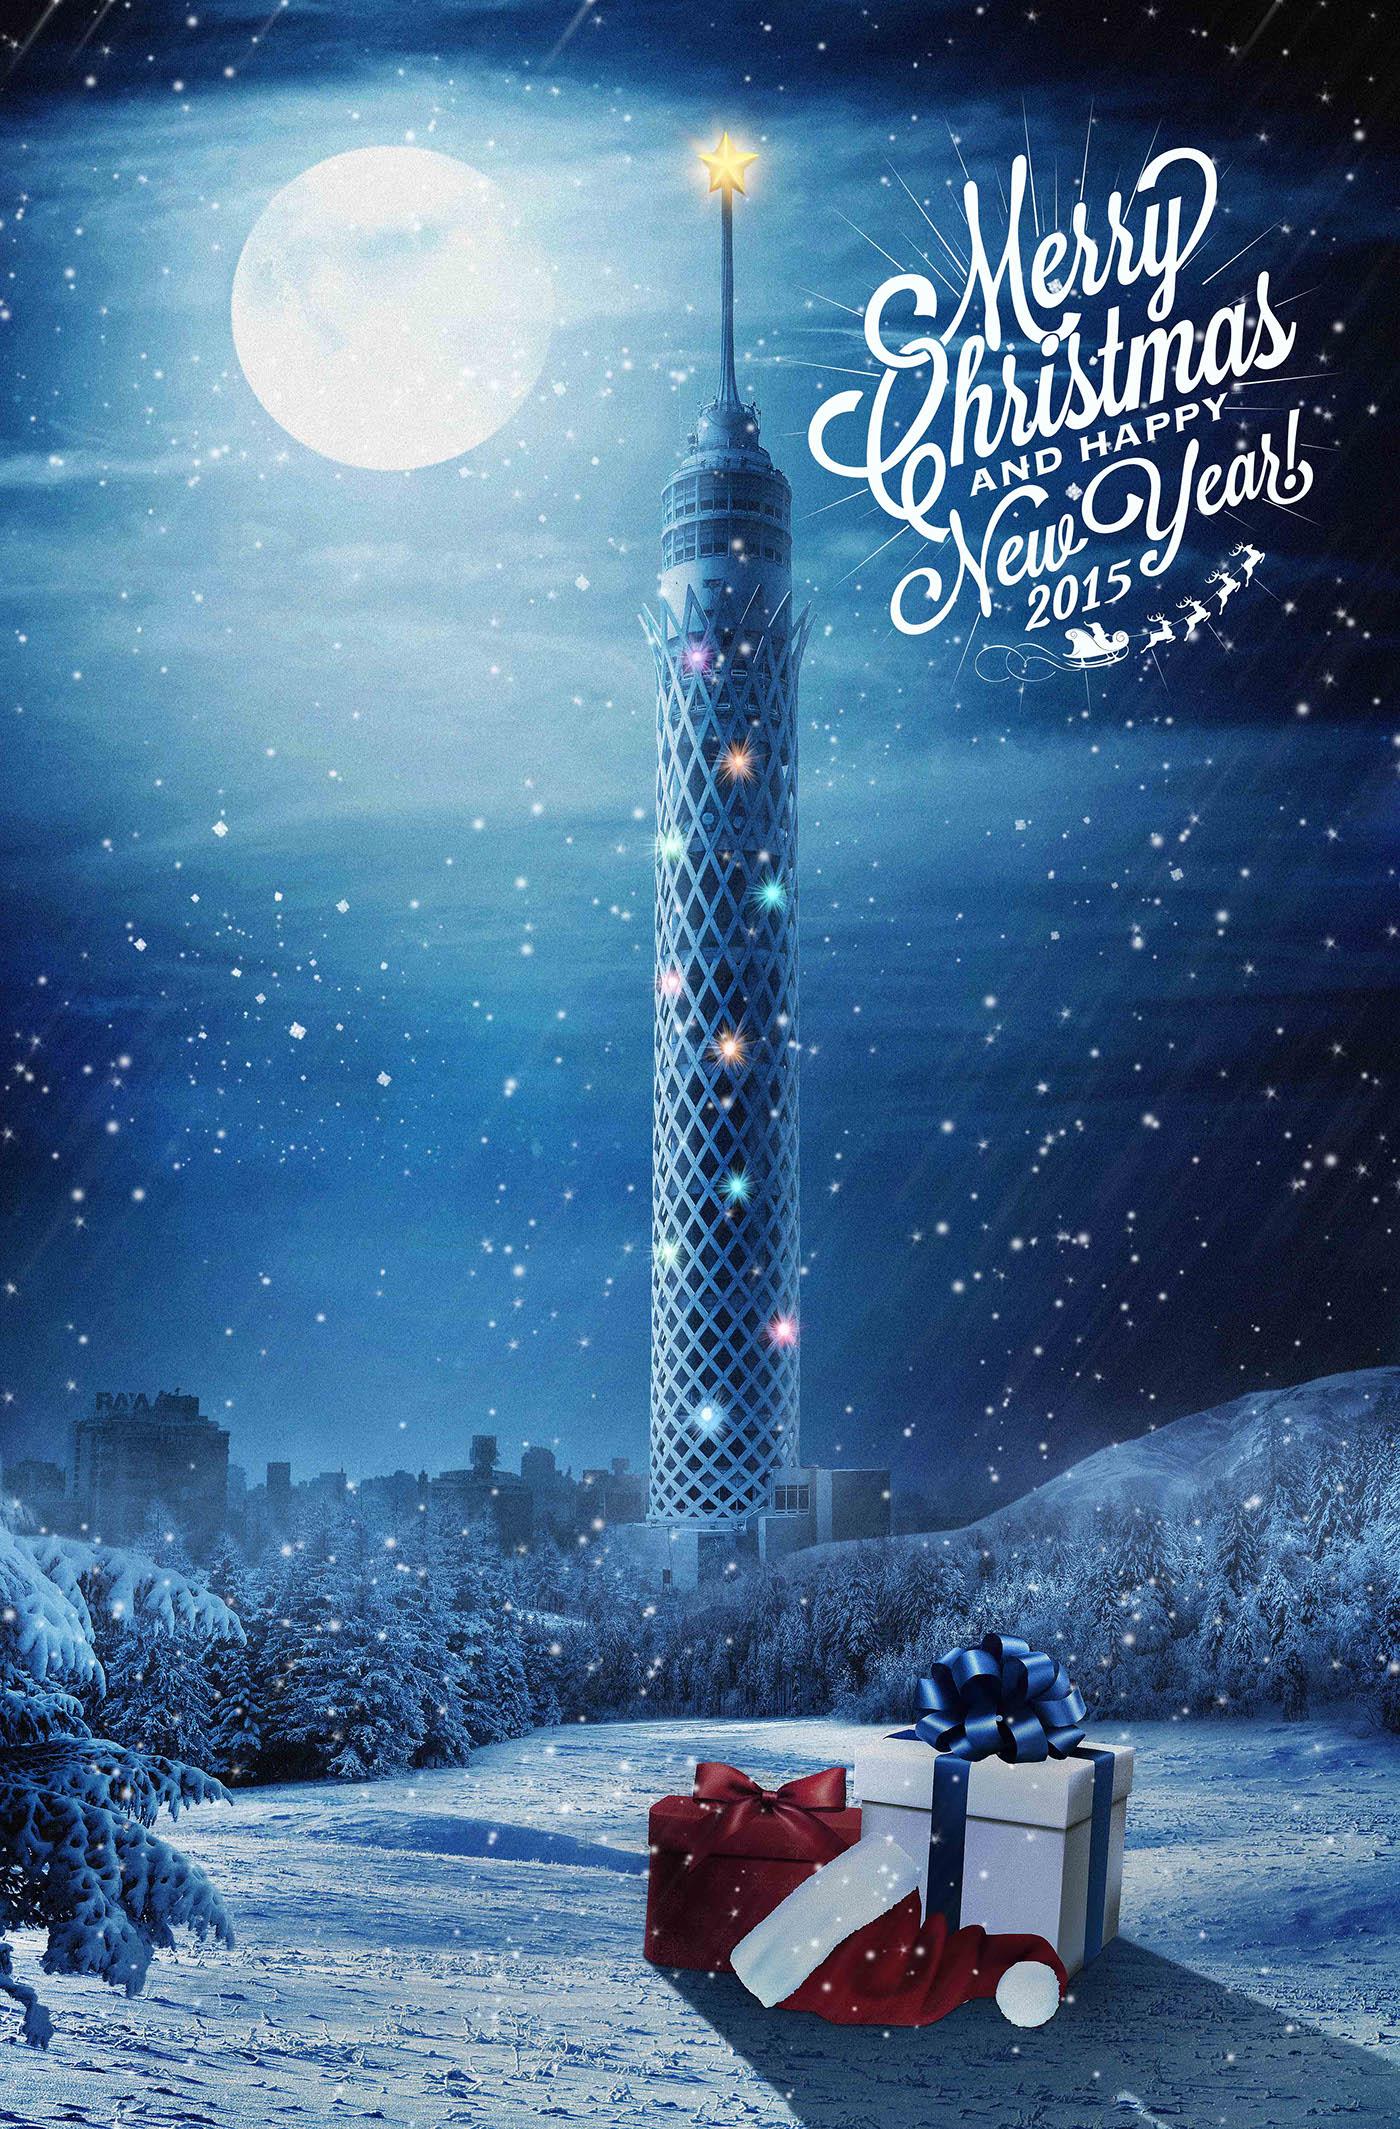 new year happy Christmas cairo night snow moon tower fantasy